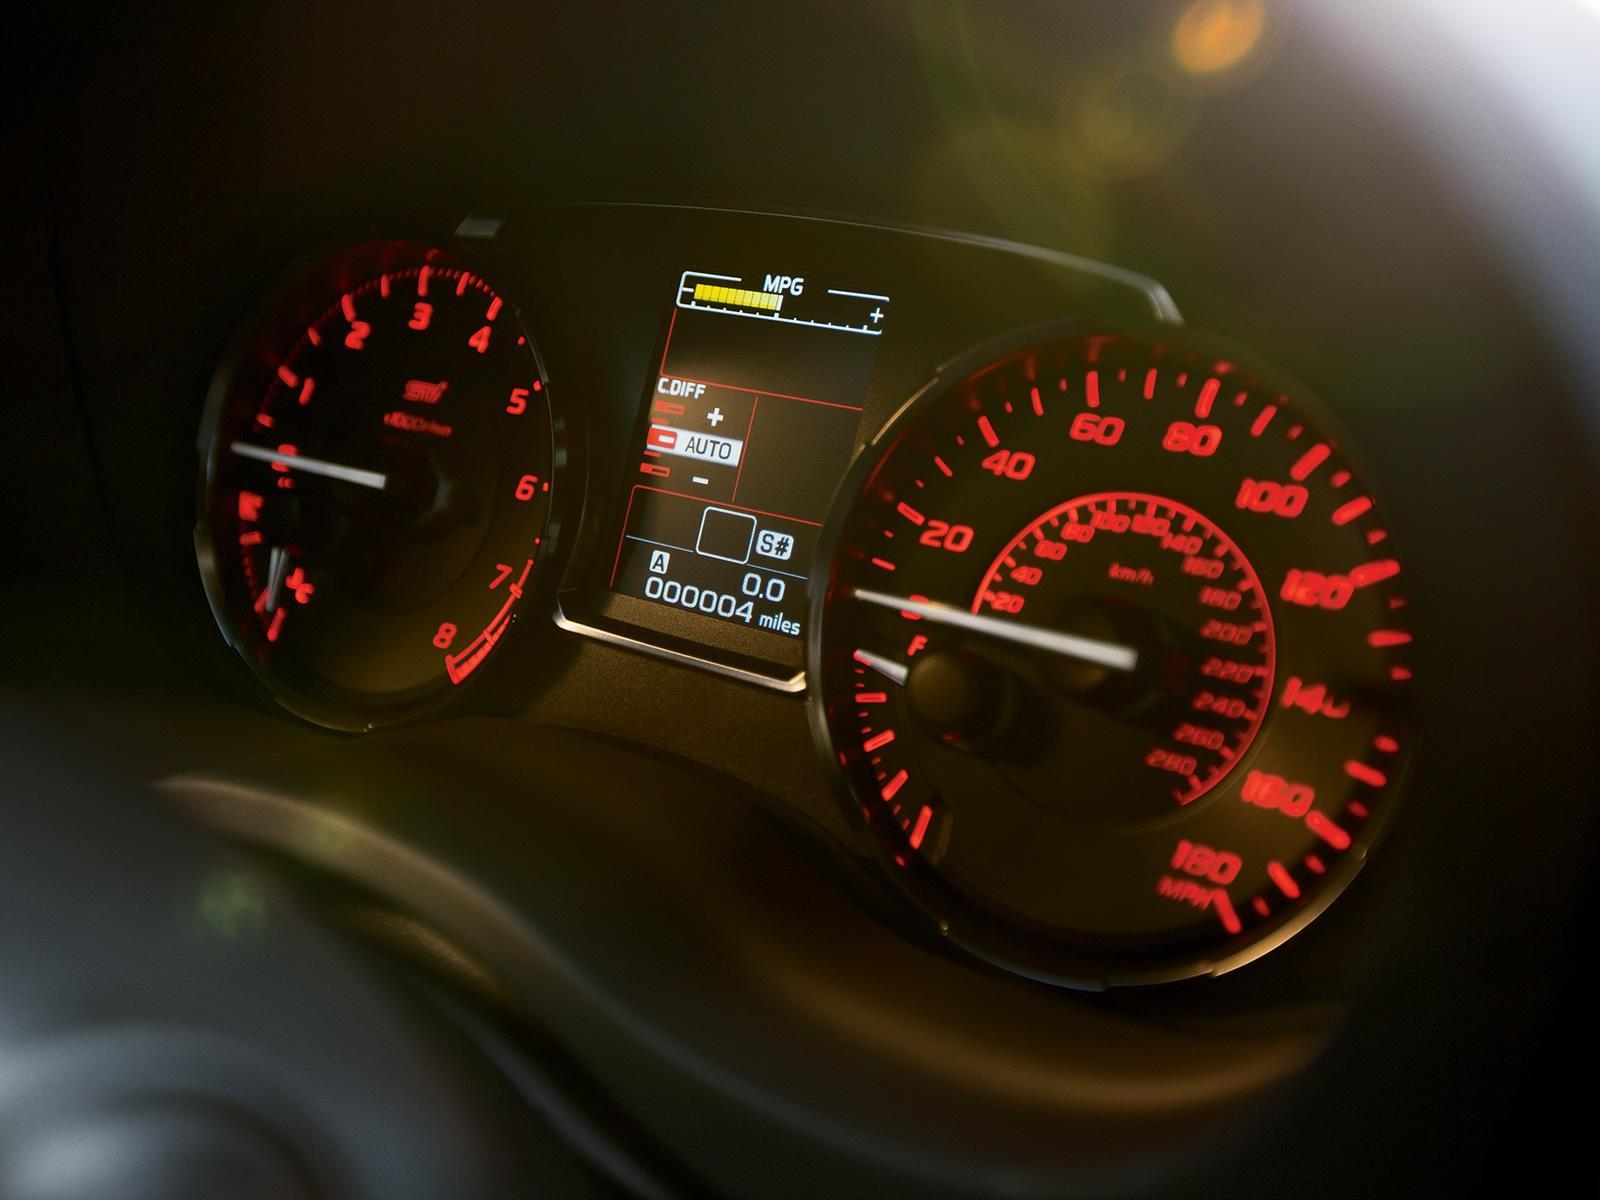 Subaru Cars - News: 2015 WRX STI officially revealed ...